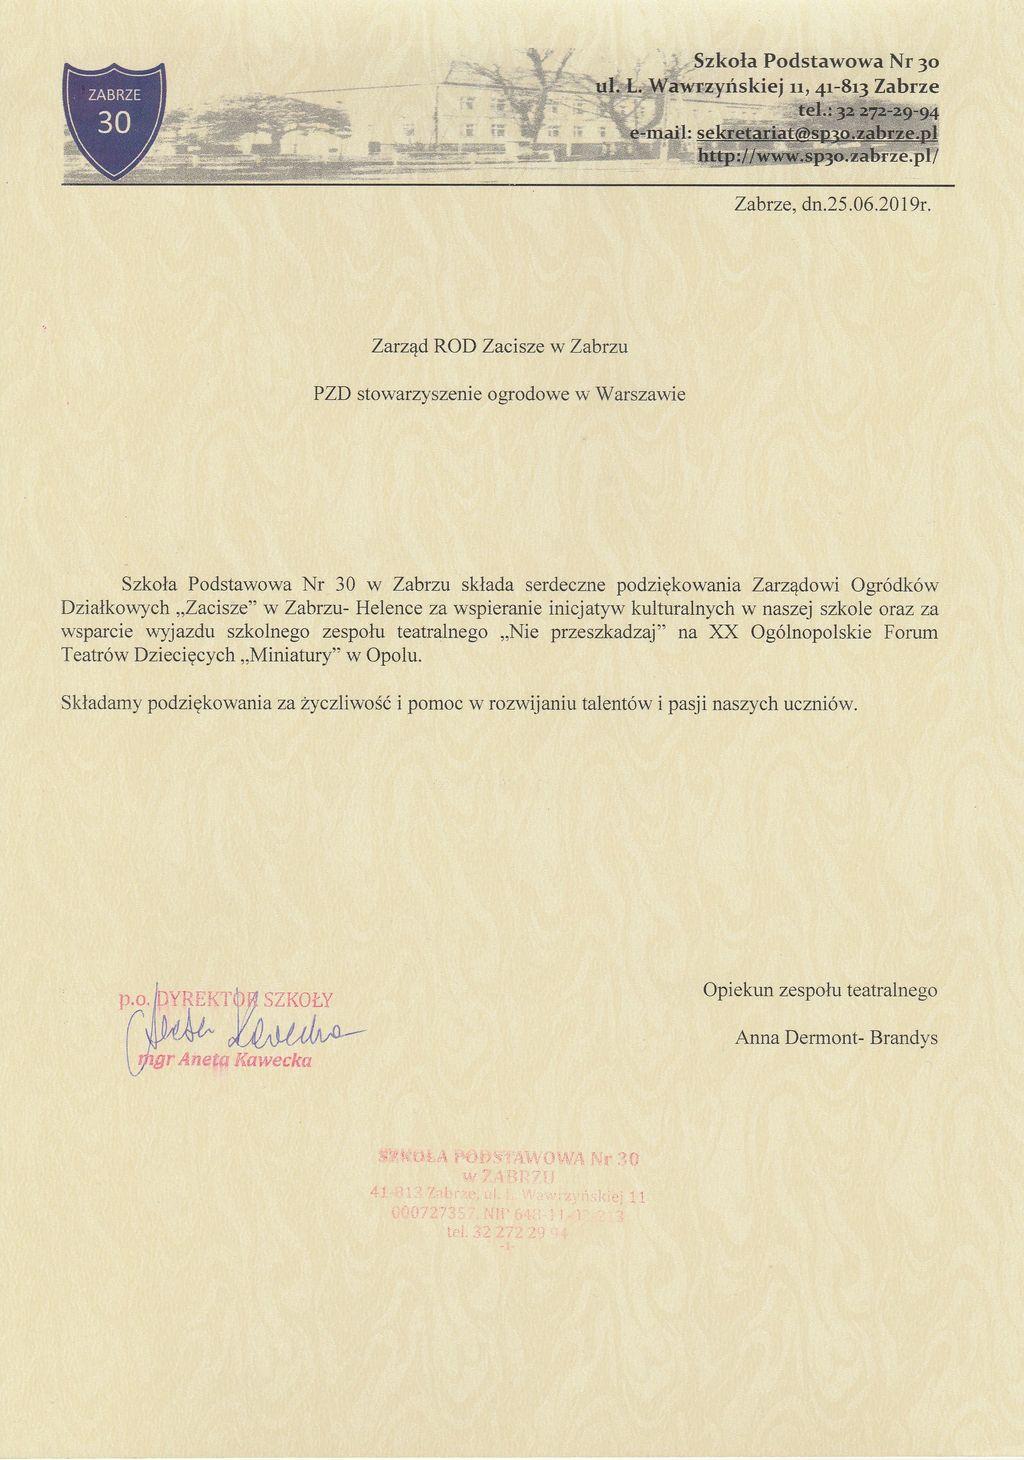 http://rodzacisze-helenka.eu/images/news/opole_teatr.005.jpg